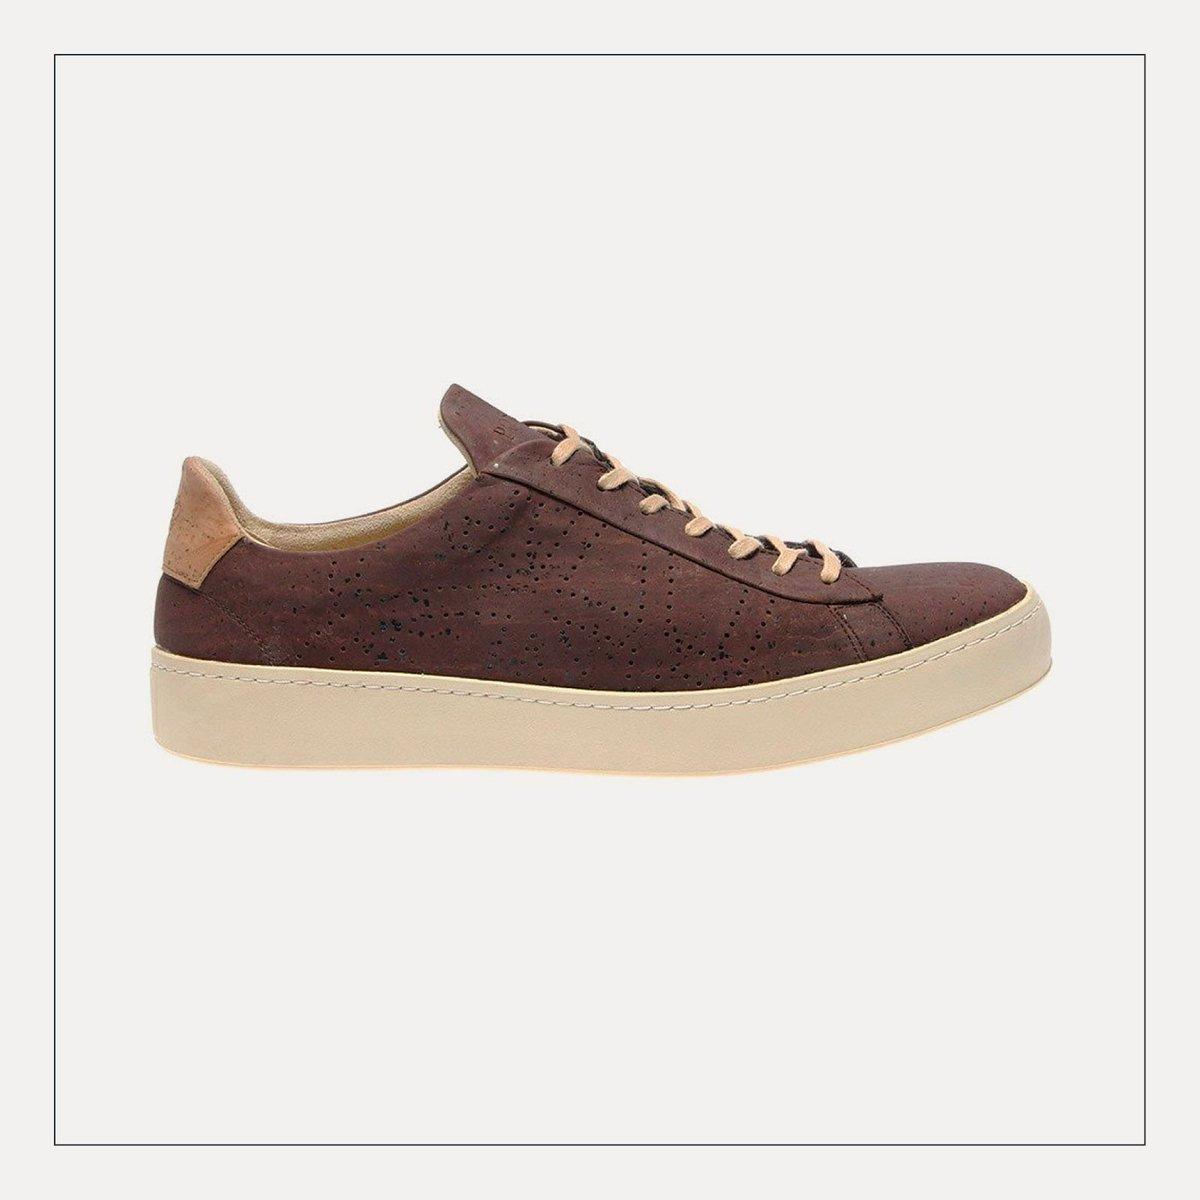 728444f65 Po-Zu Shoes on Twitter